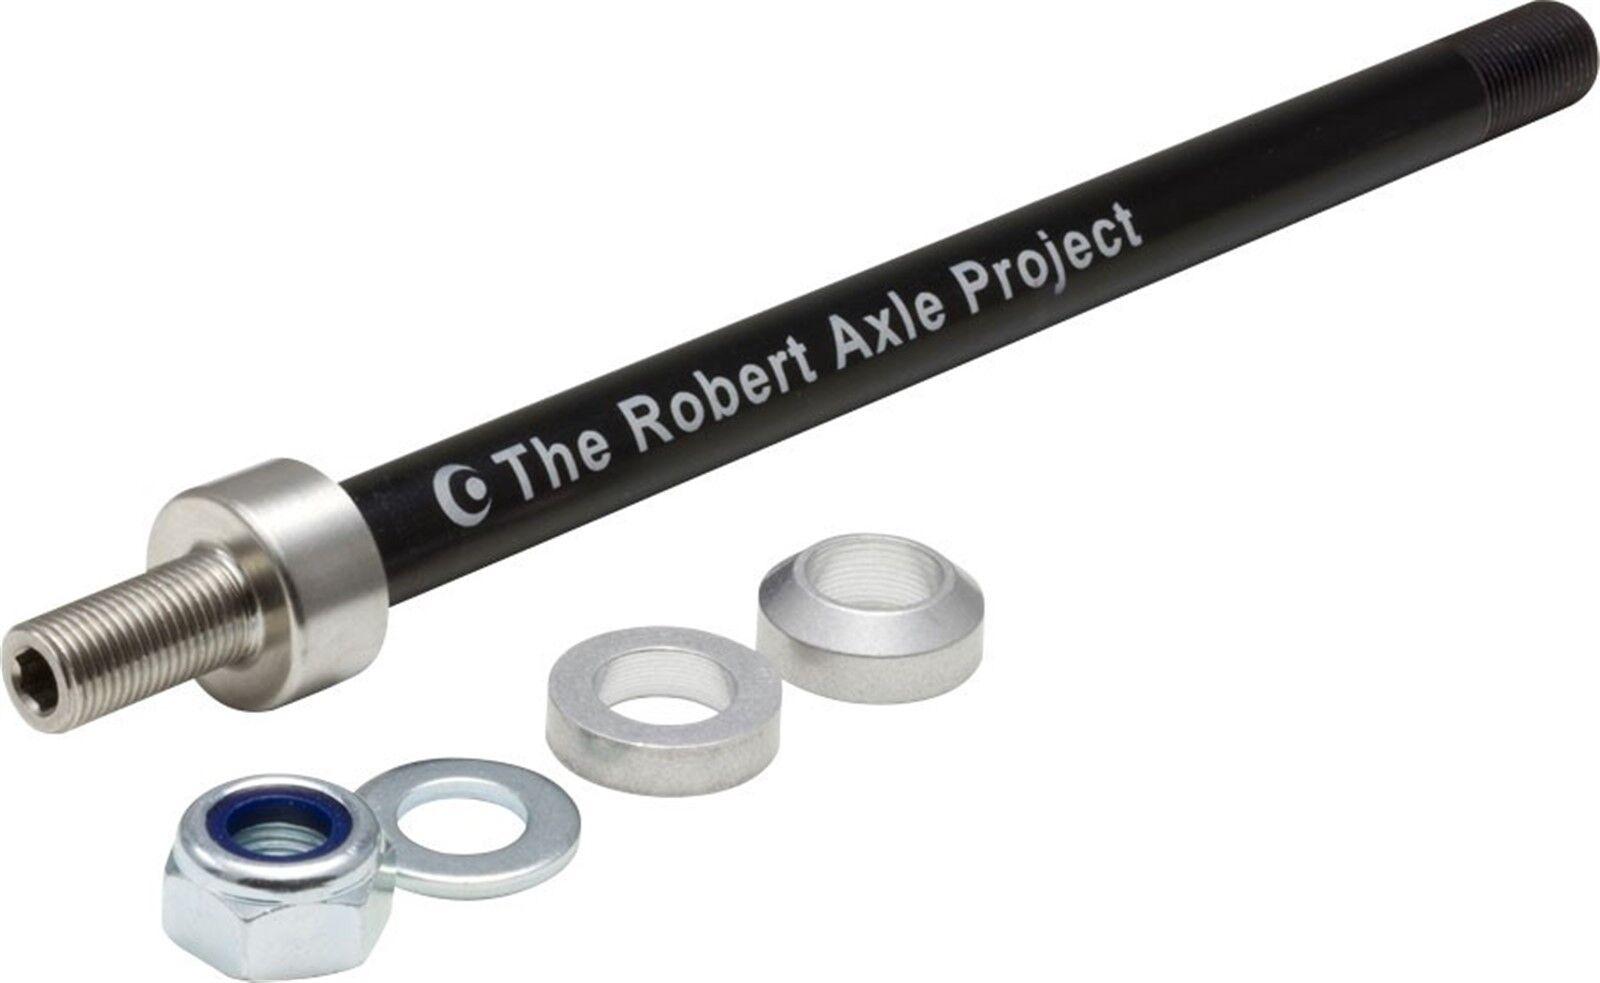 Robert Axle Project Kid Trailer 12mm Thru Thread: Axle Length: 152 or 167mm Thread: Thru 5257c4